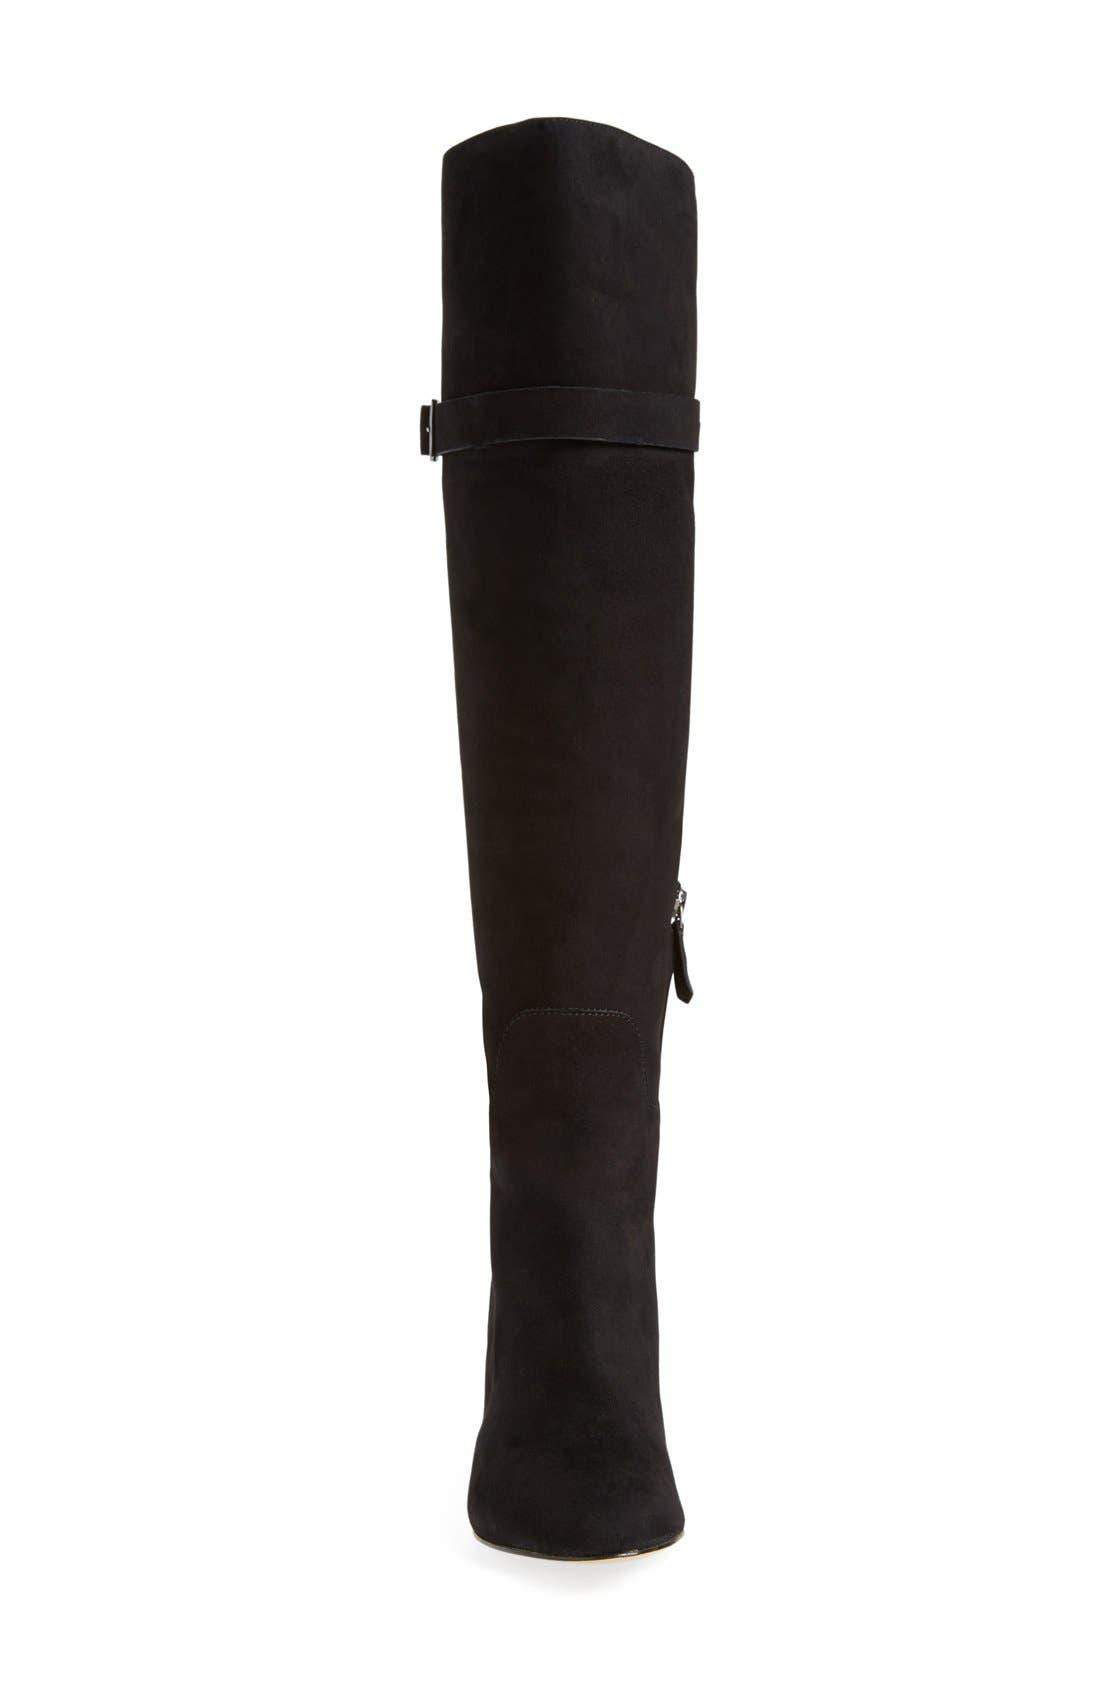 Alternate Image 3  - Pour la Victoire'Dania' Over the Knee Boot (Women)